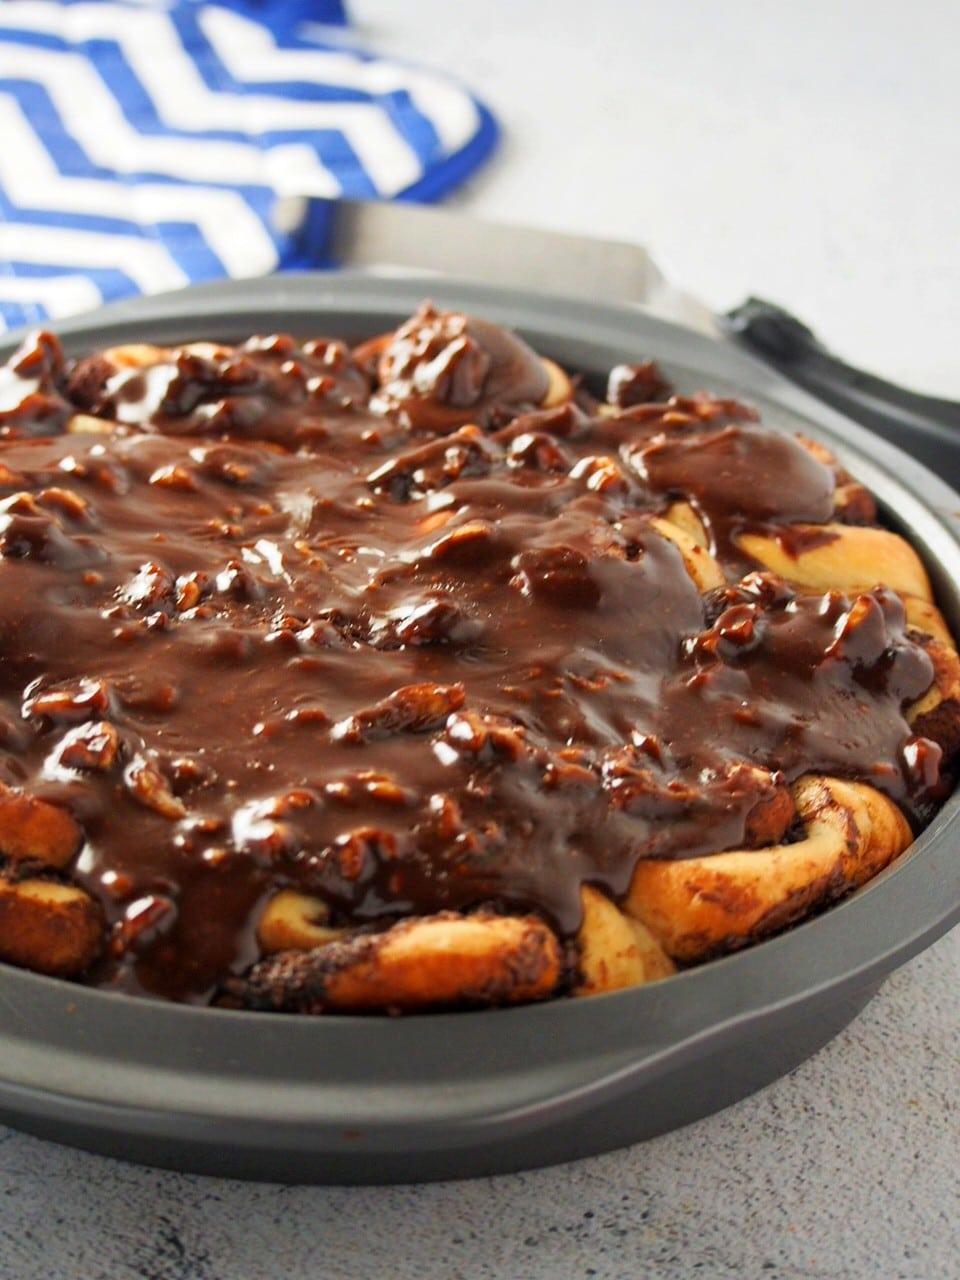 Fresh Nutella rolls on the baking pan.